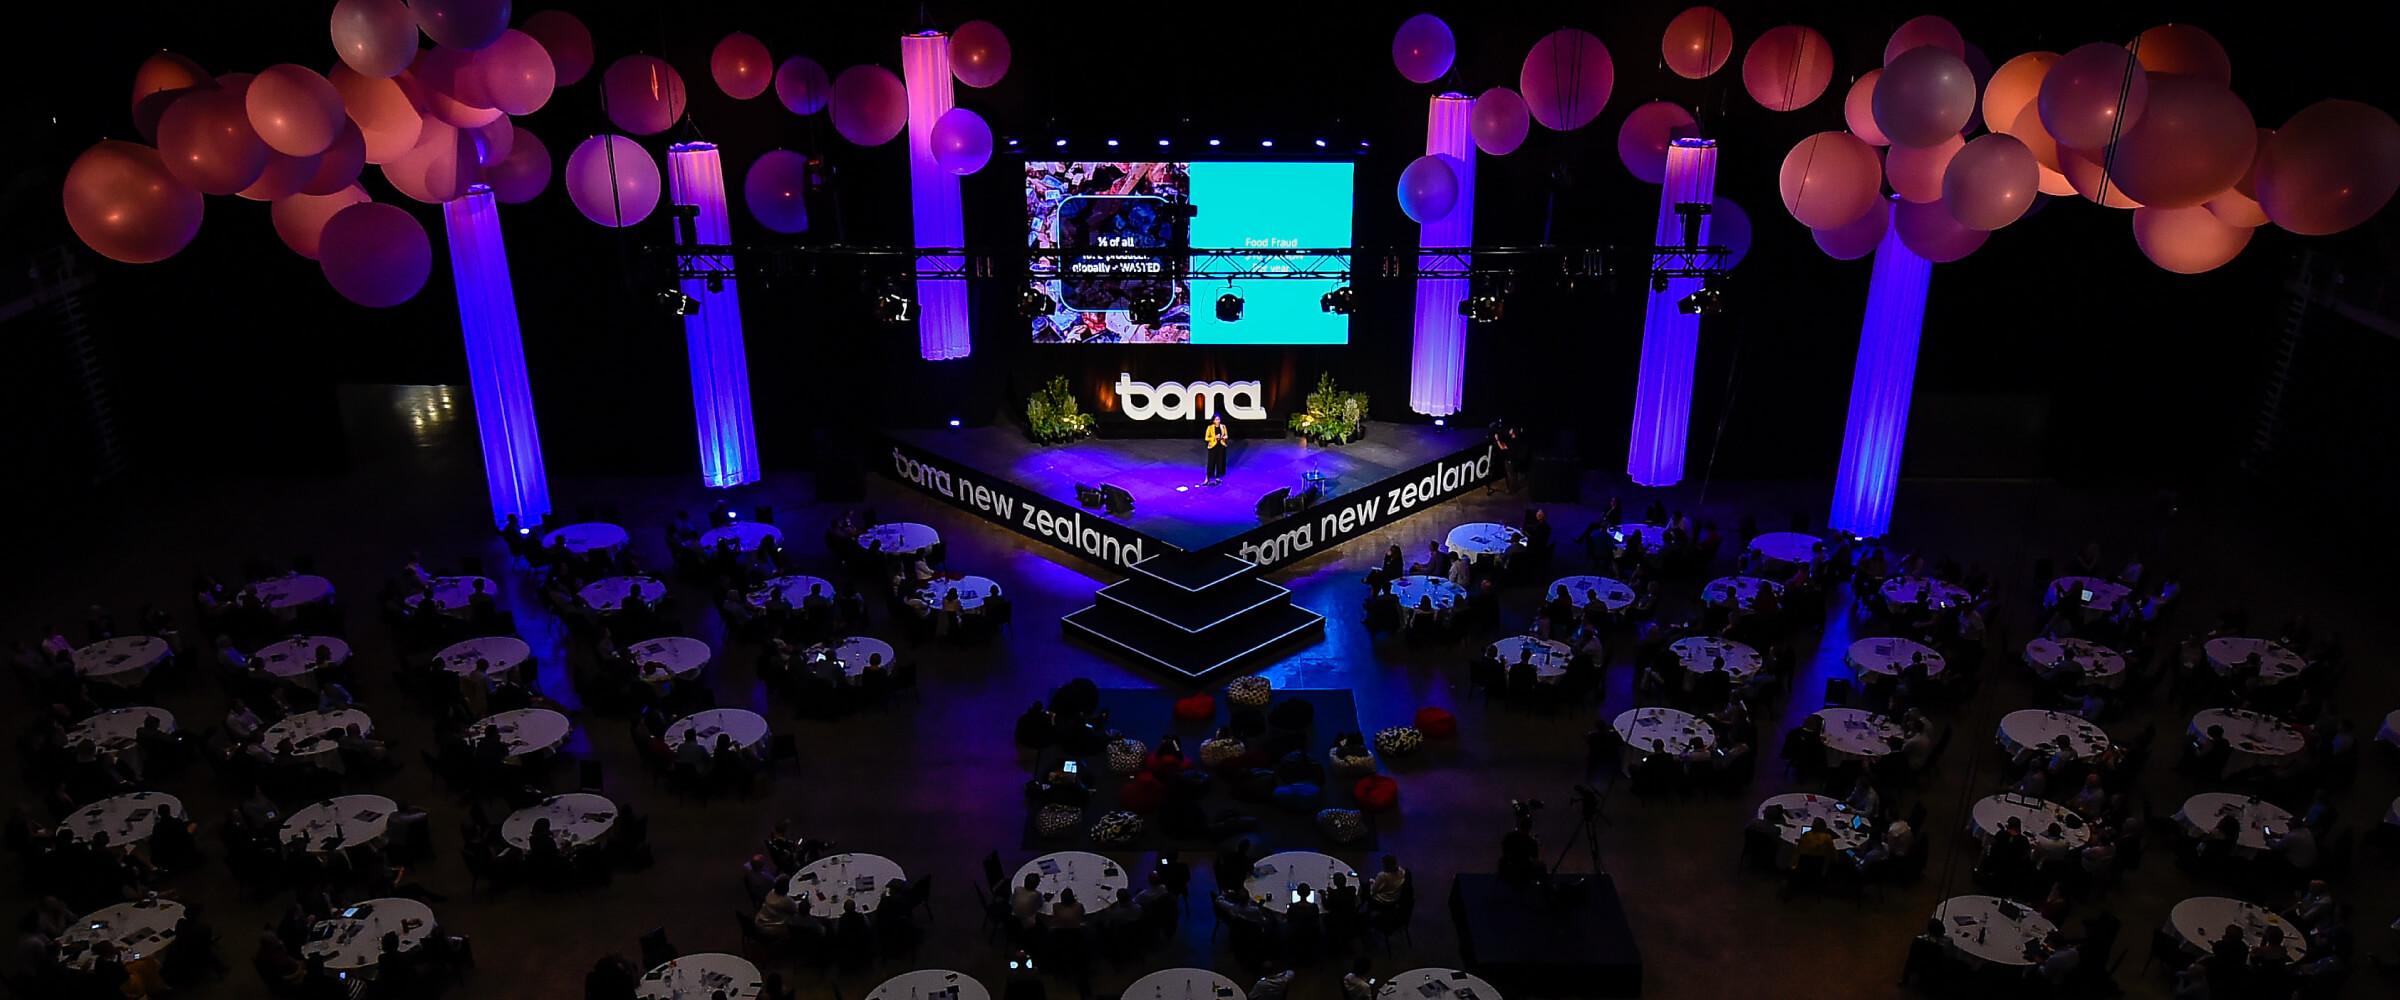 E Tipu 2021: The Boma NZ Agri Summit